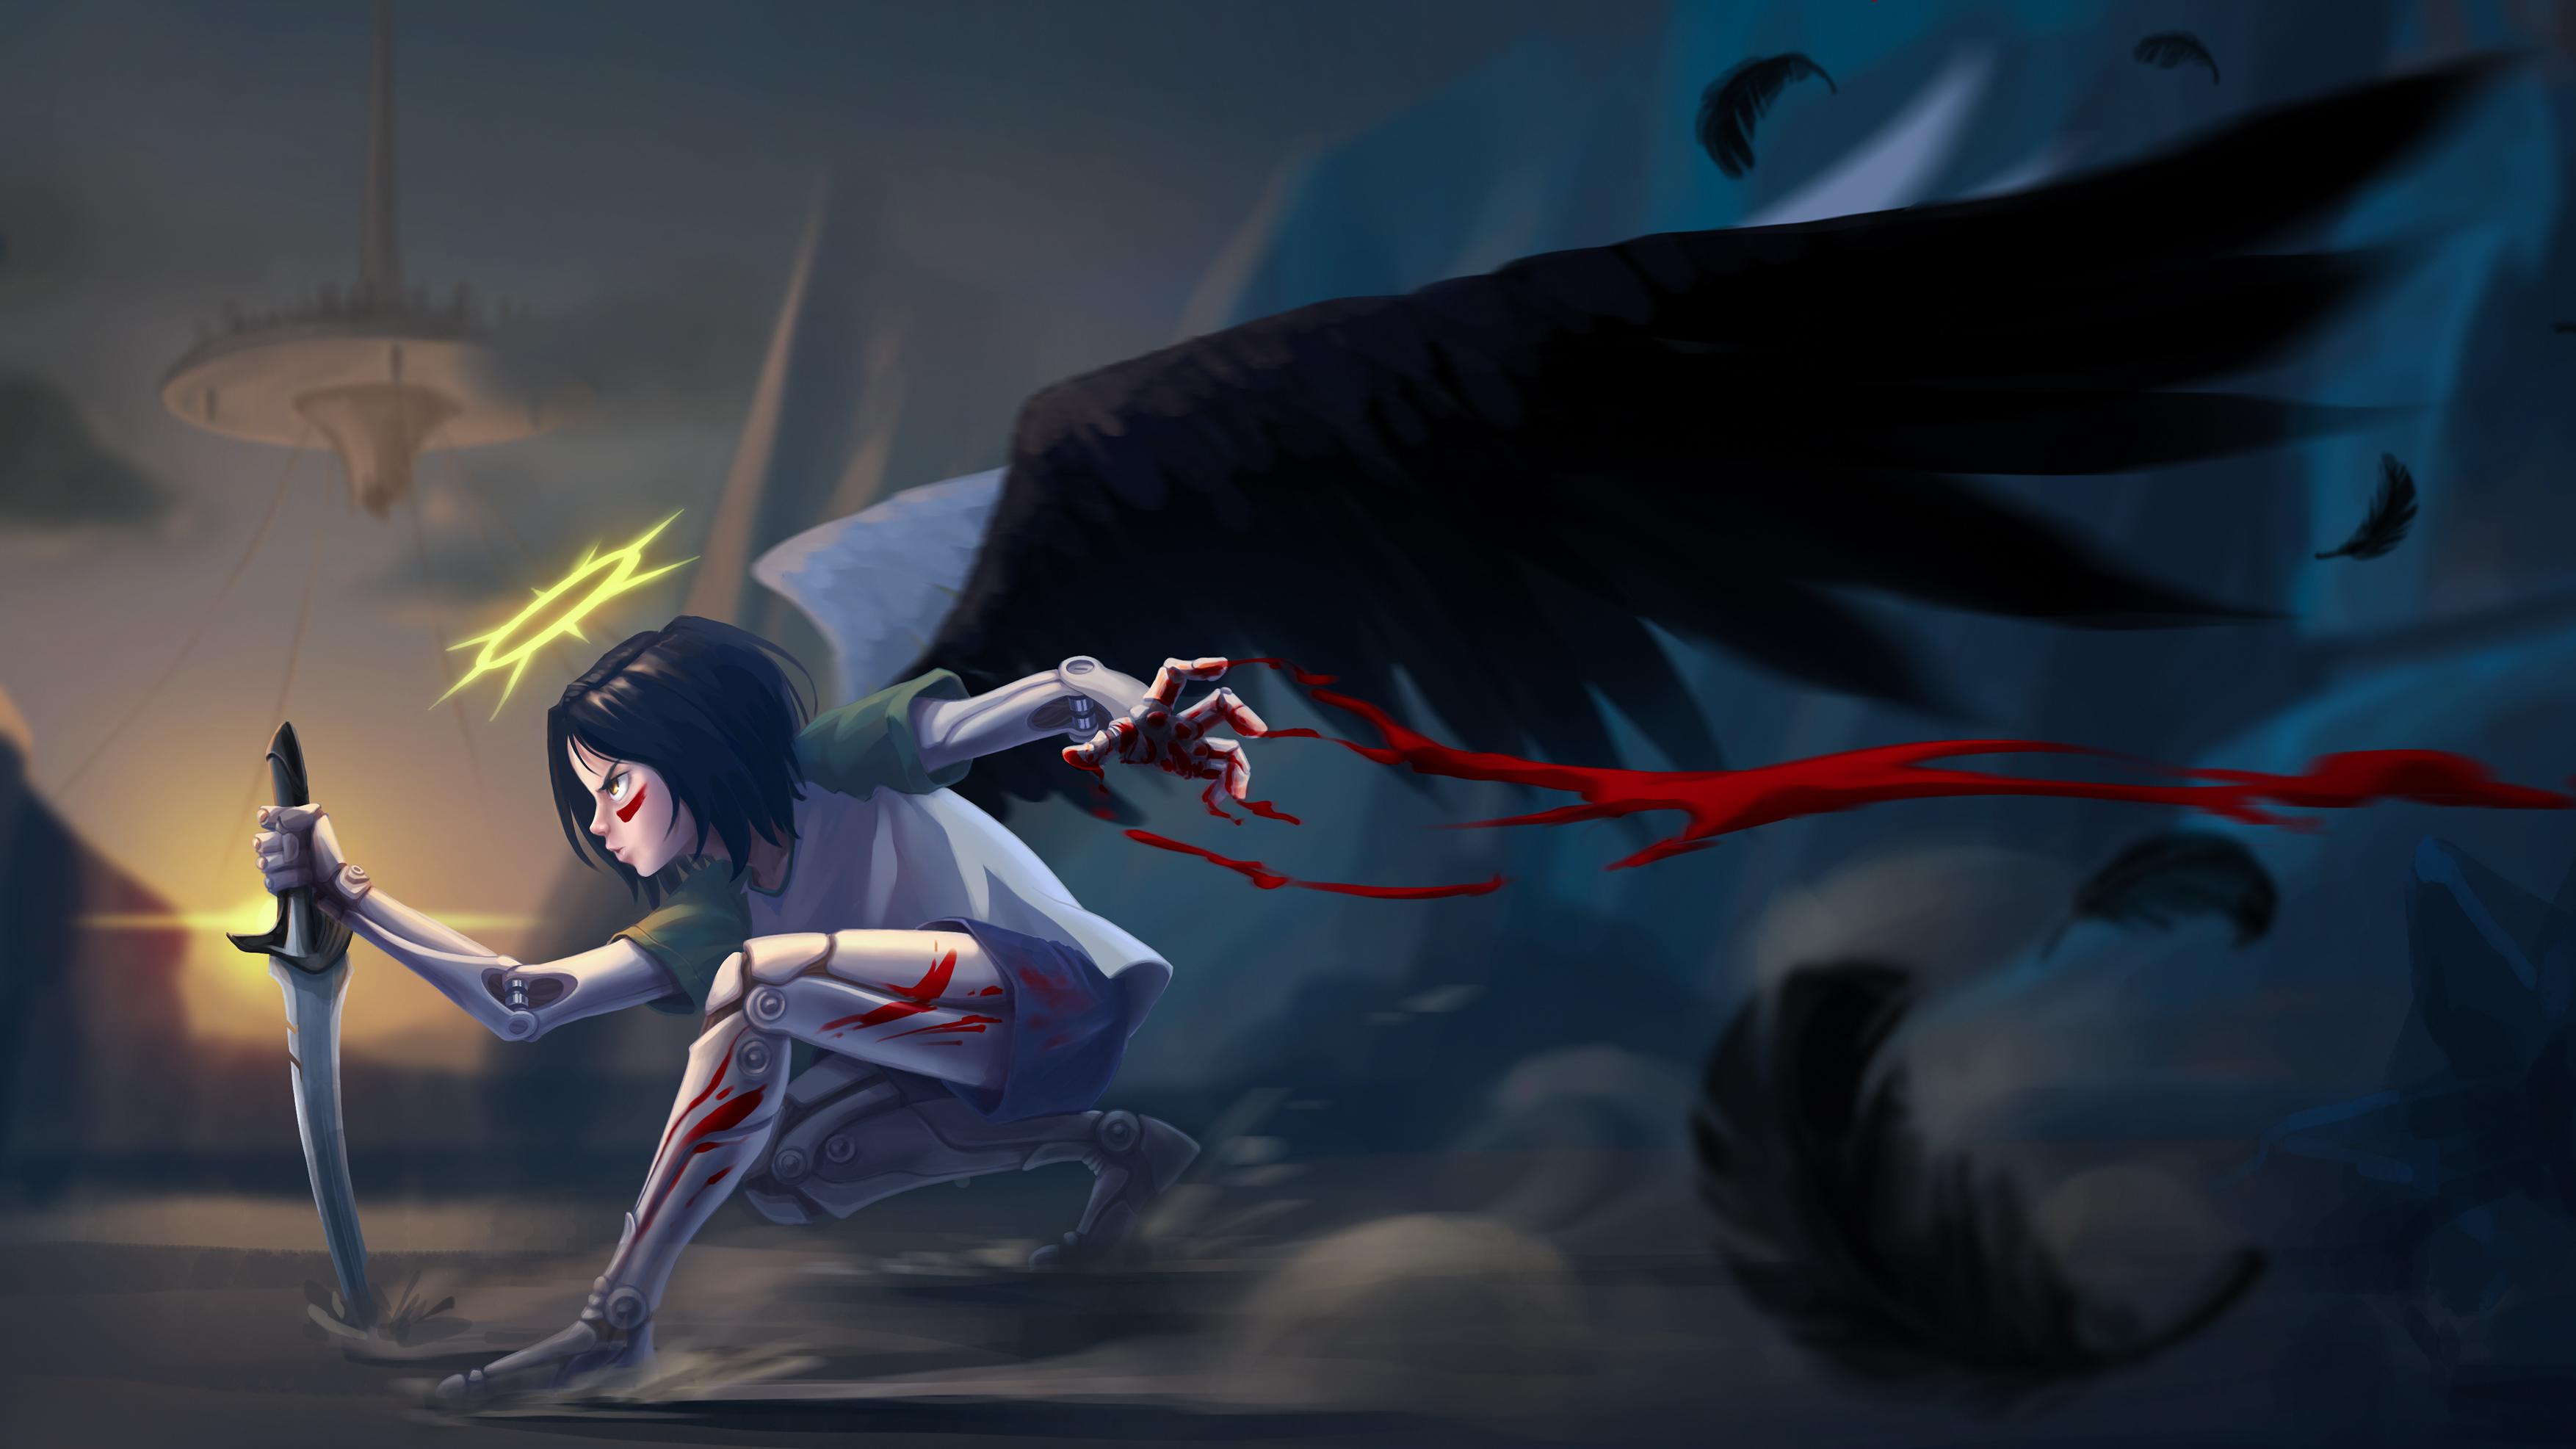 Free Download Alita Battle Angel Hd Wallpaper Background Image